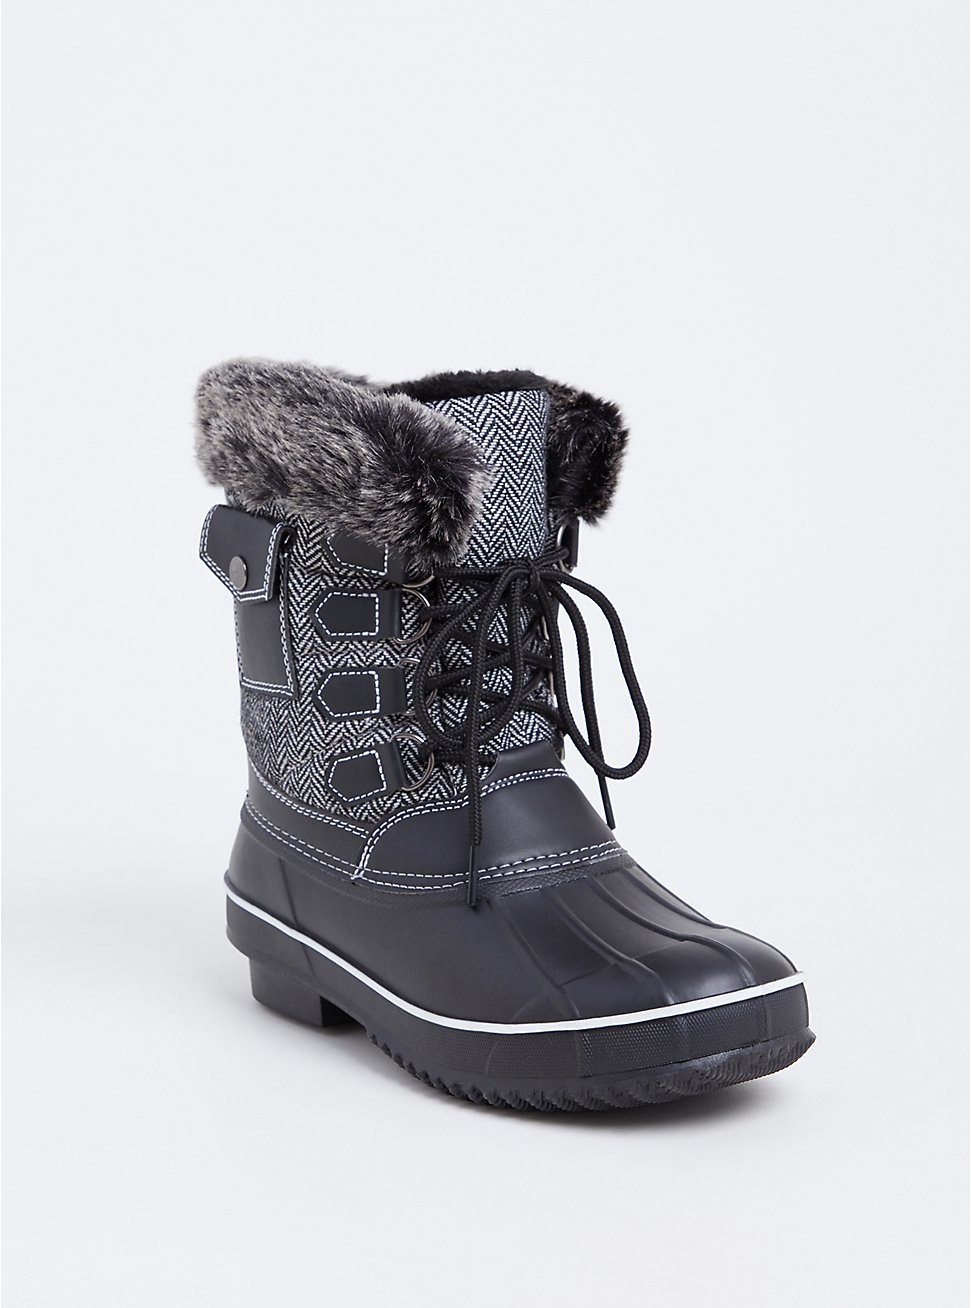 Black Herringbone Faux Leather & Faux Fur Cold-Weather Bootie (WW), BLACK, hi-res